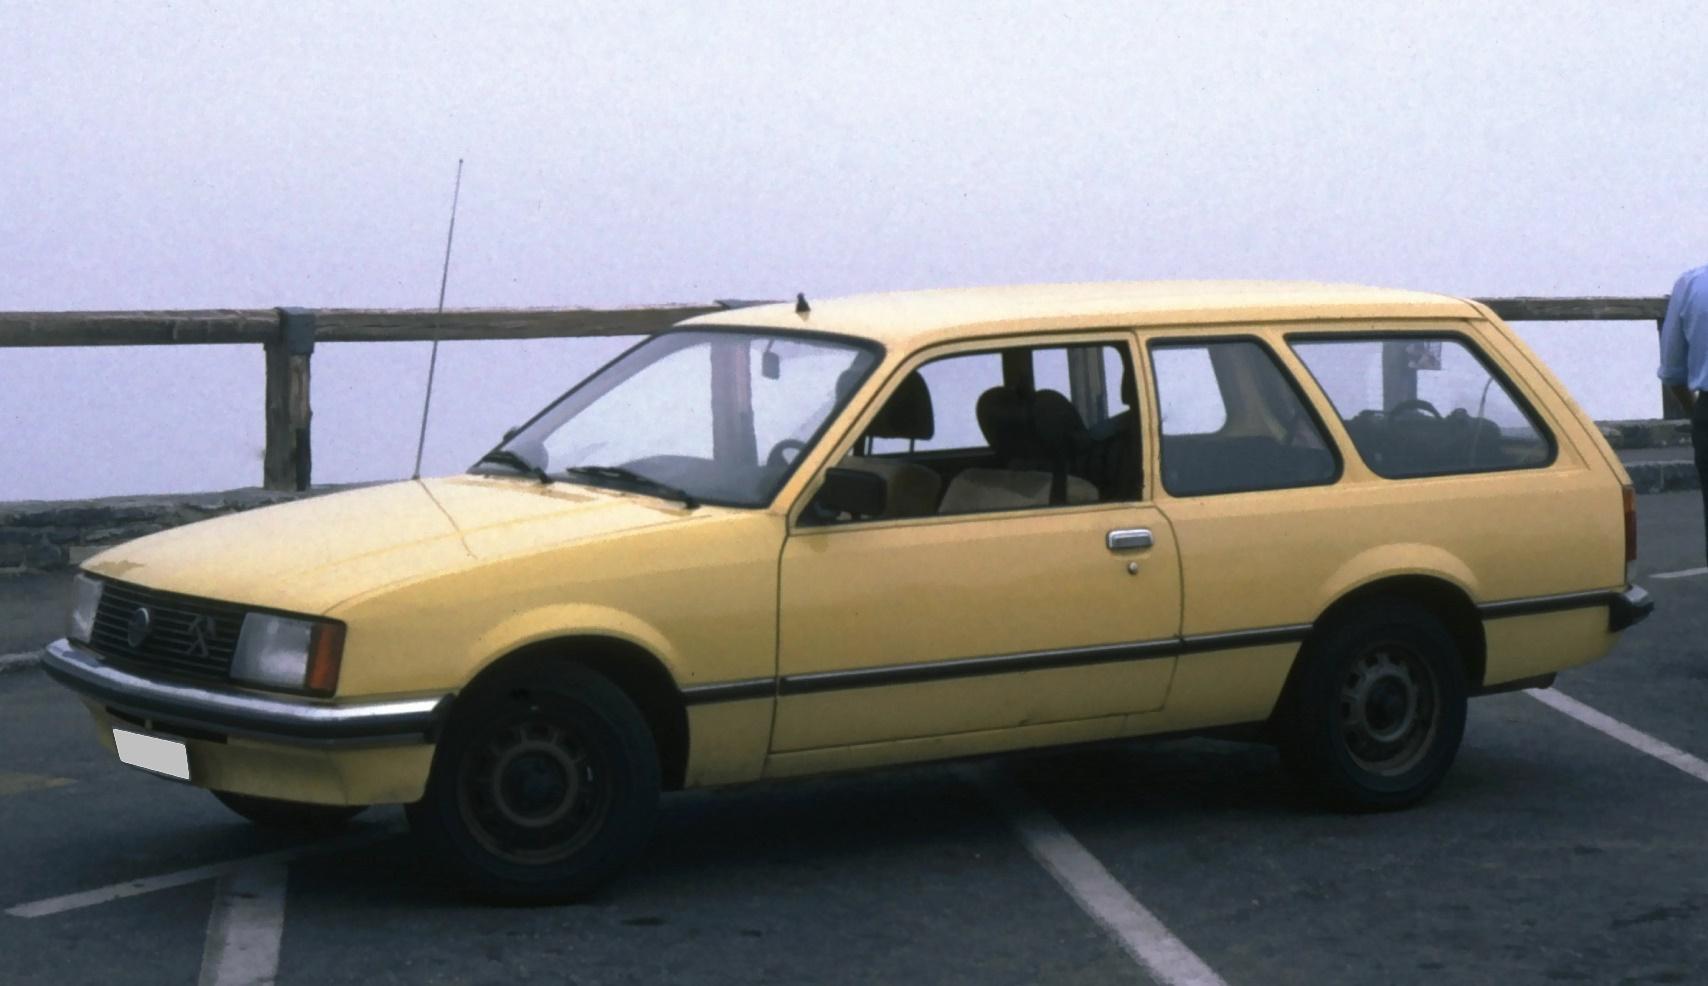 Opel Rekord Series E - Wikipedia, the free encyclopedia